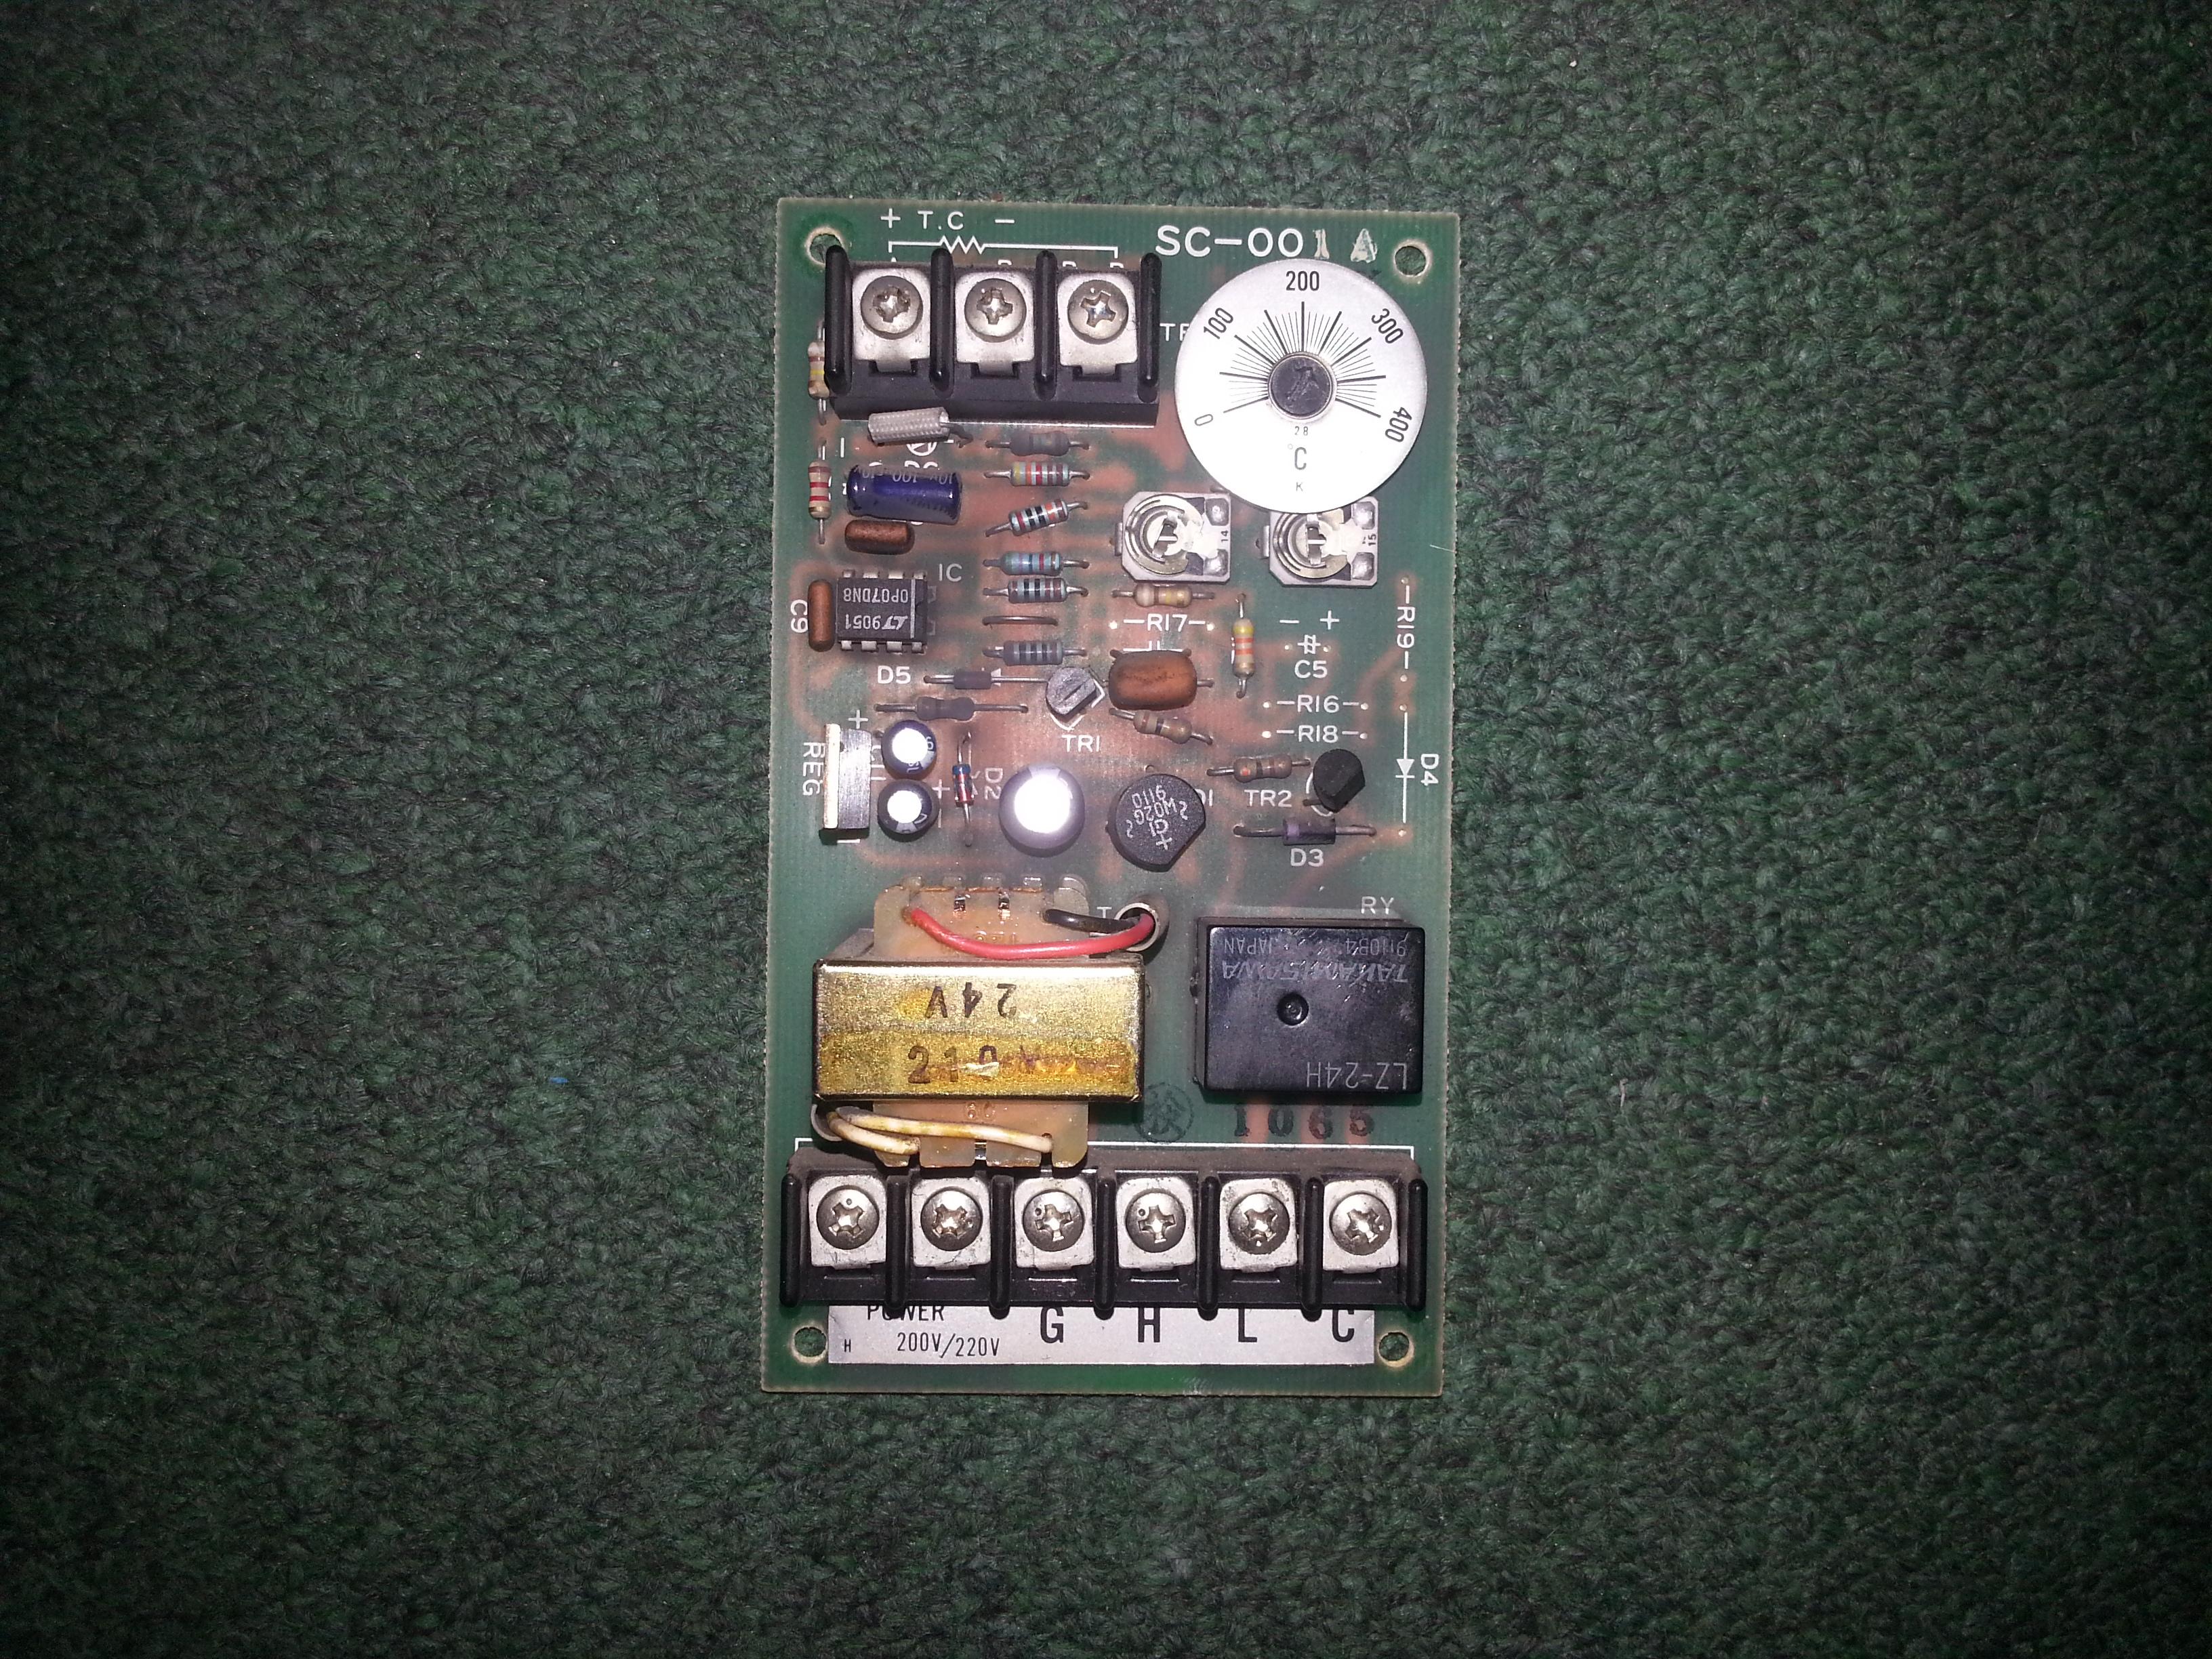 Repair GH LC SC-001A EVCO PCB BOARD in Malaysia, Singapore, Thailand, Indonesia